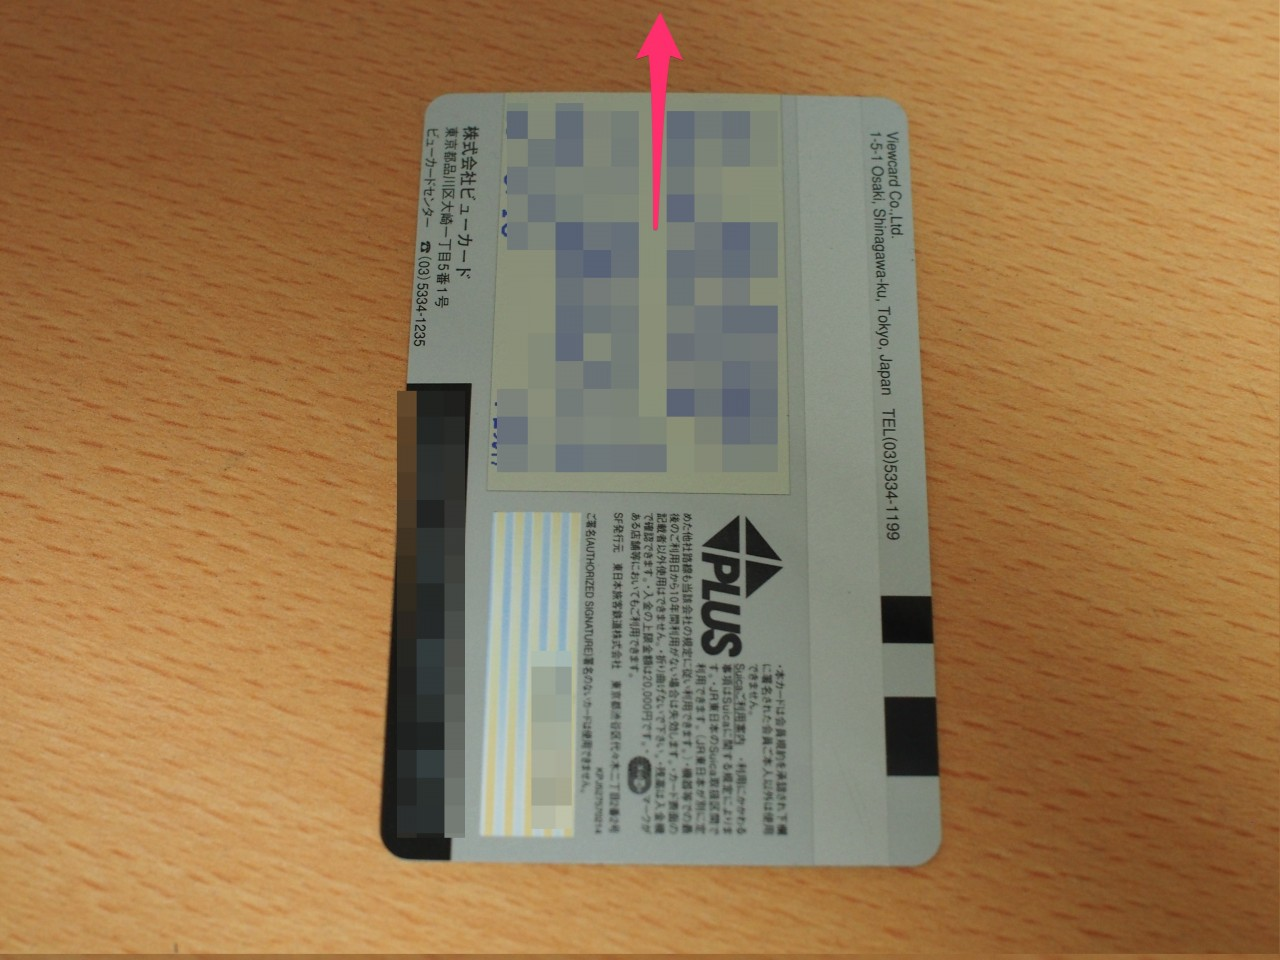 card2 2